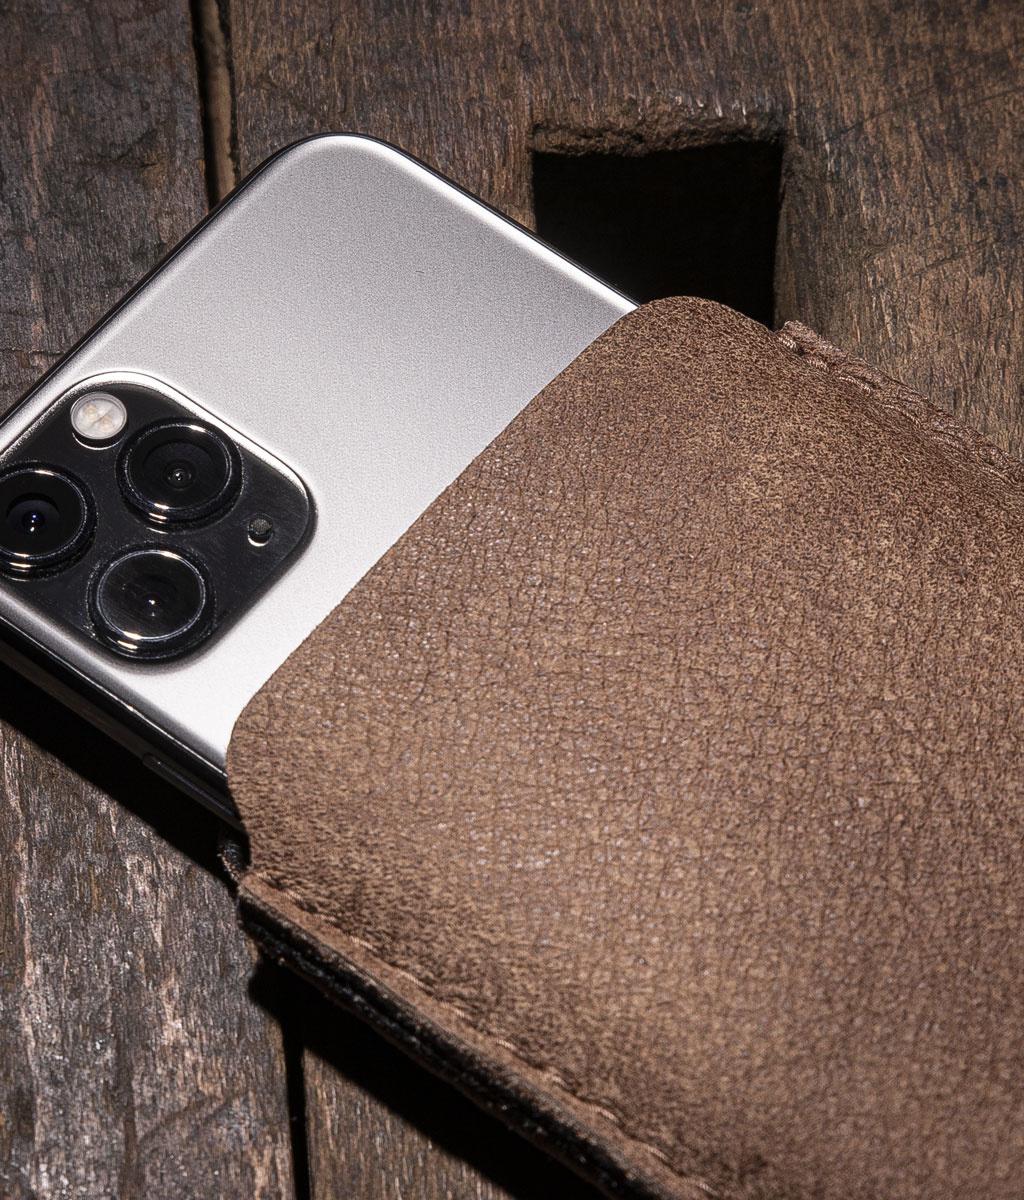 iPhone 13 12 11 Pro SE Max mini 8 Ledertasche, Lederhülle mit Filz Futter DATENSCHUTZ